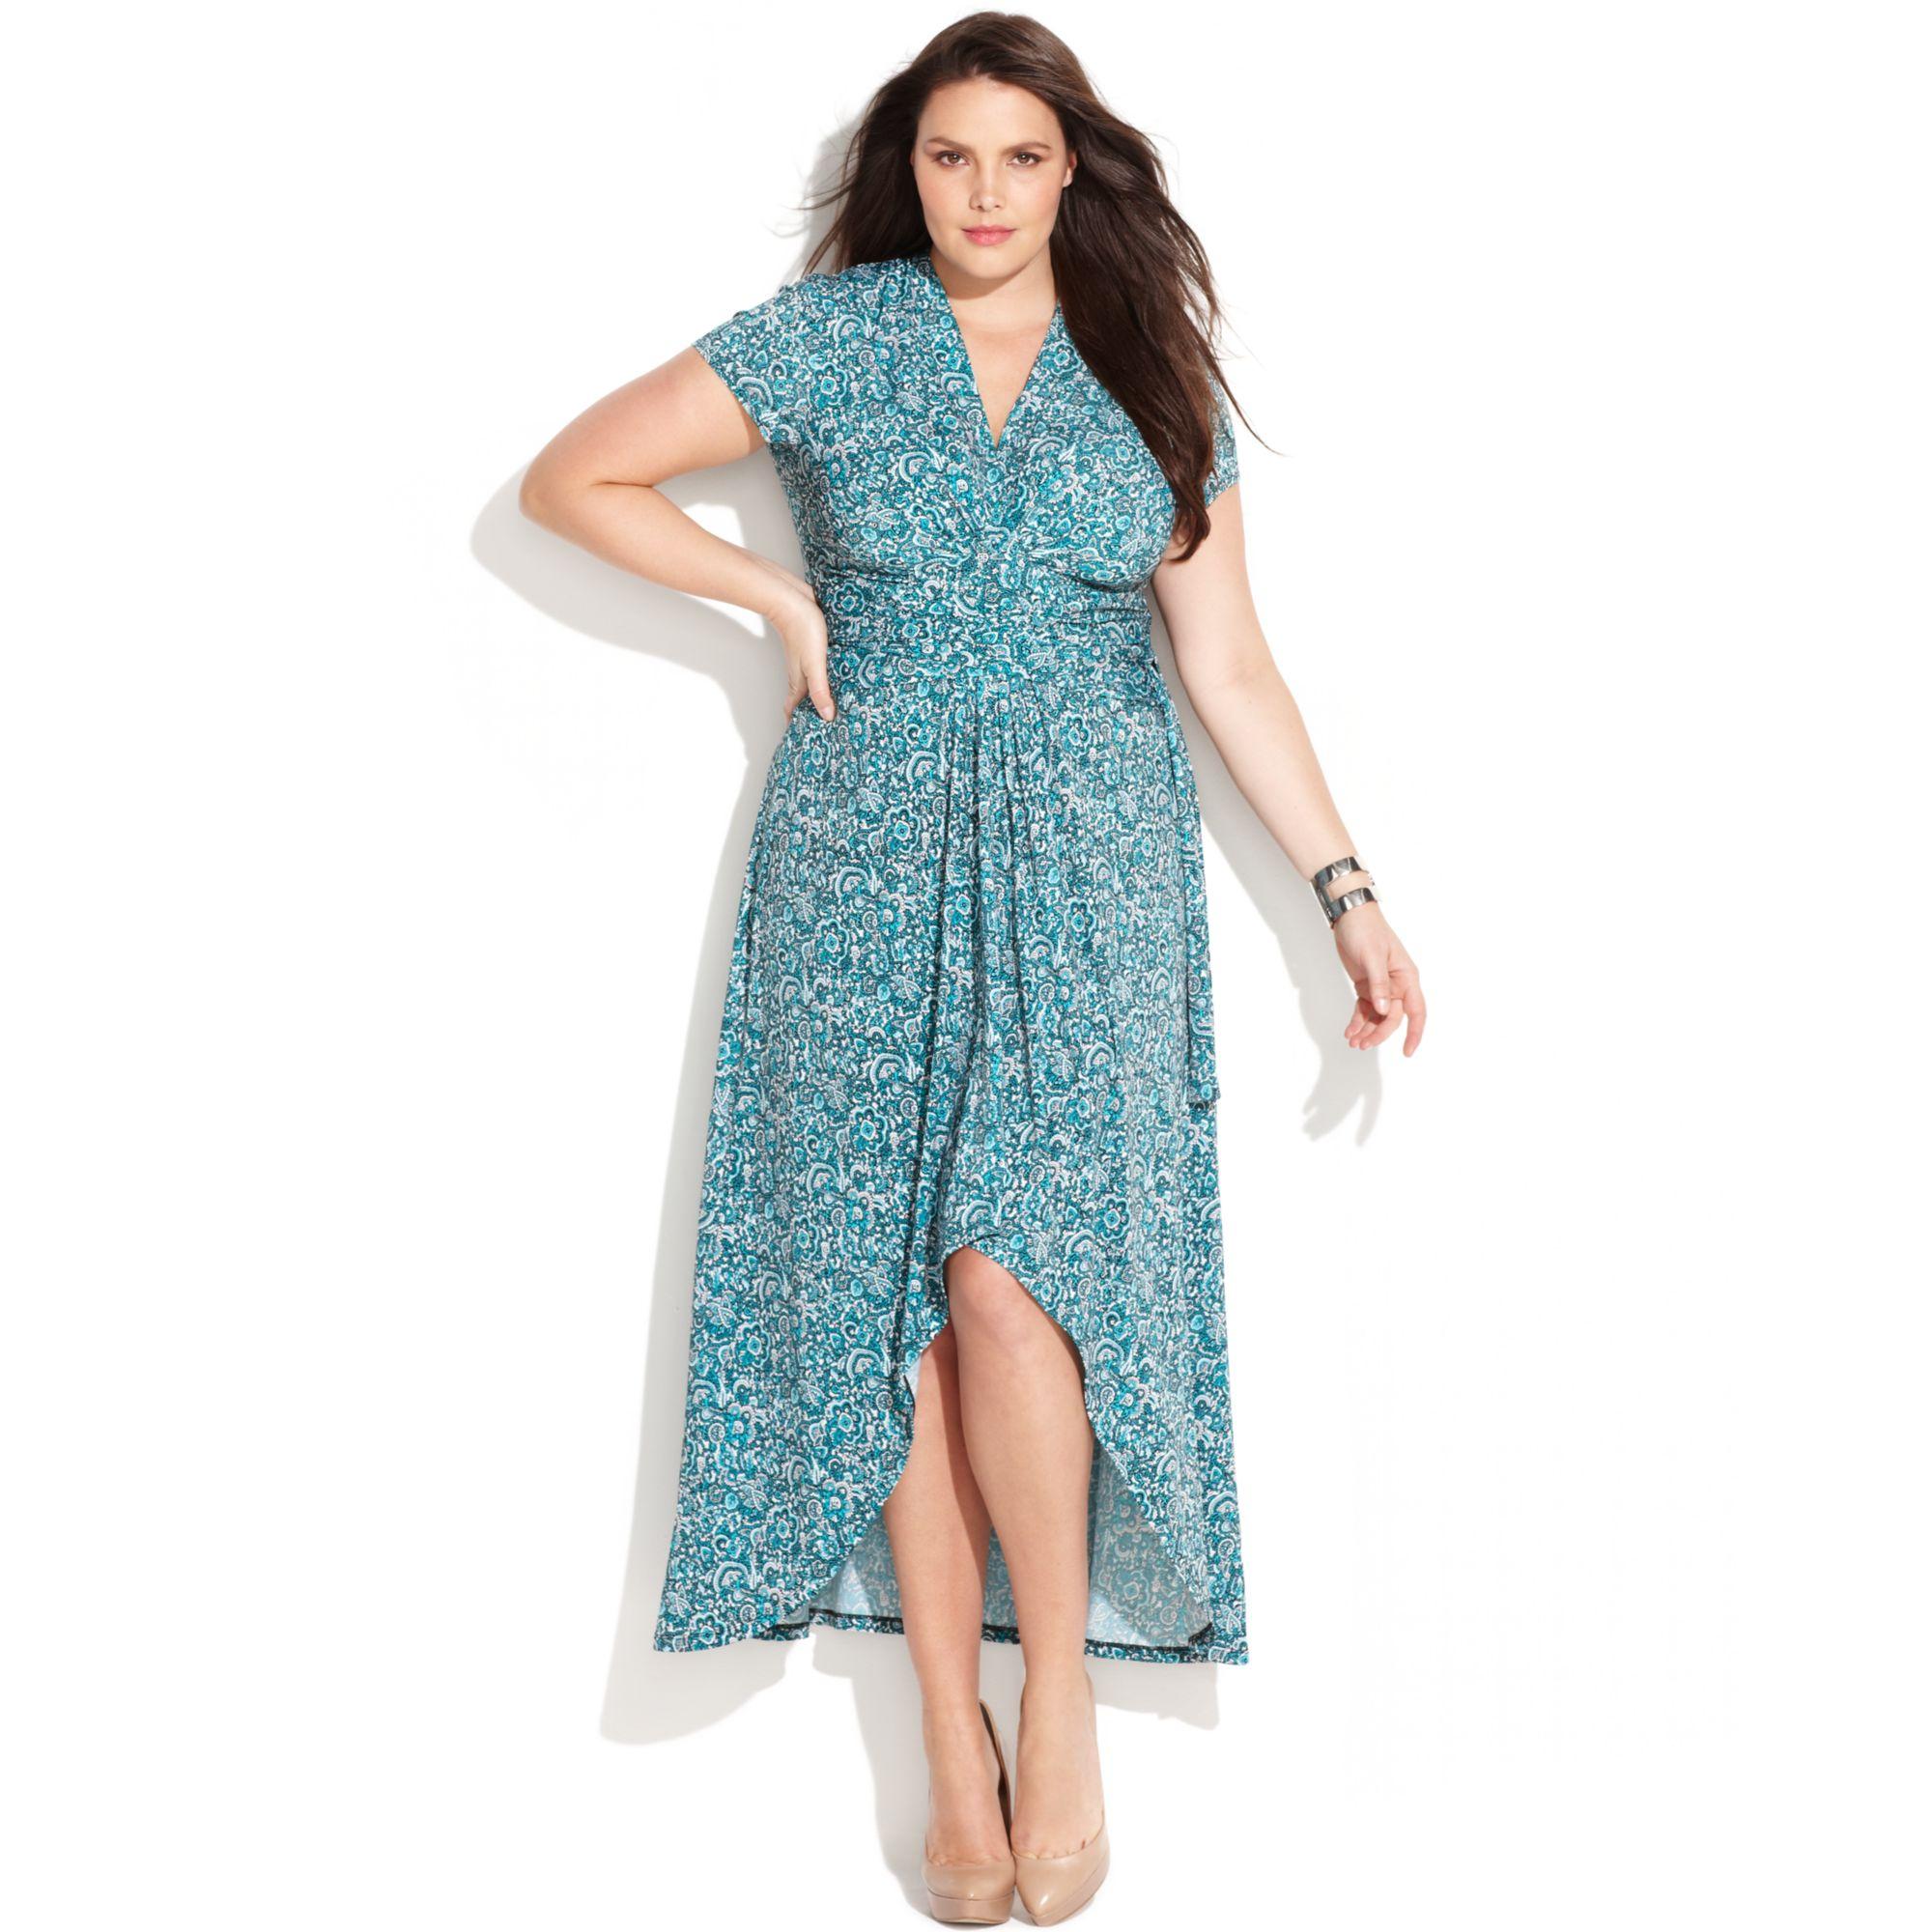 Michael Kors Blue Plus Size Printed Faux Wrap Maxi Dress